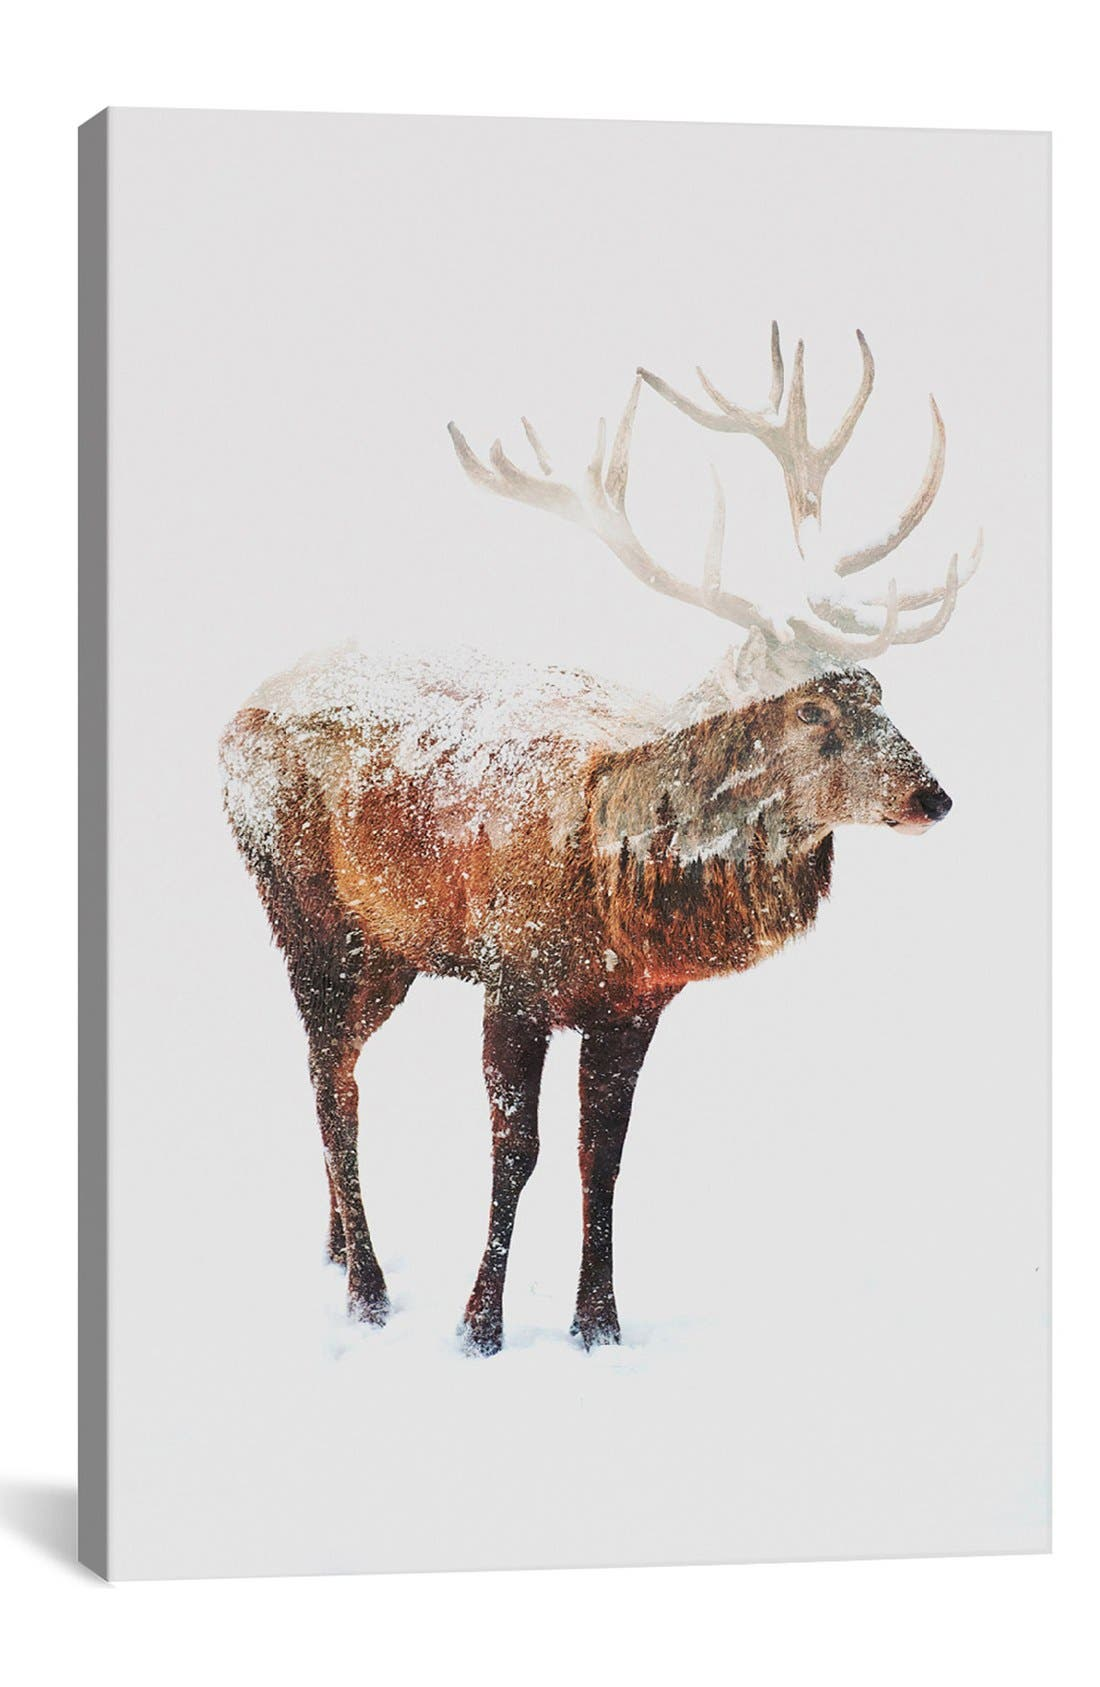 'Deer V' Giclée Print Canvas Art,                         Main,                         color, 200